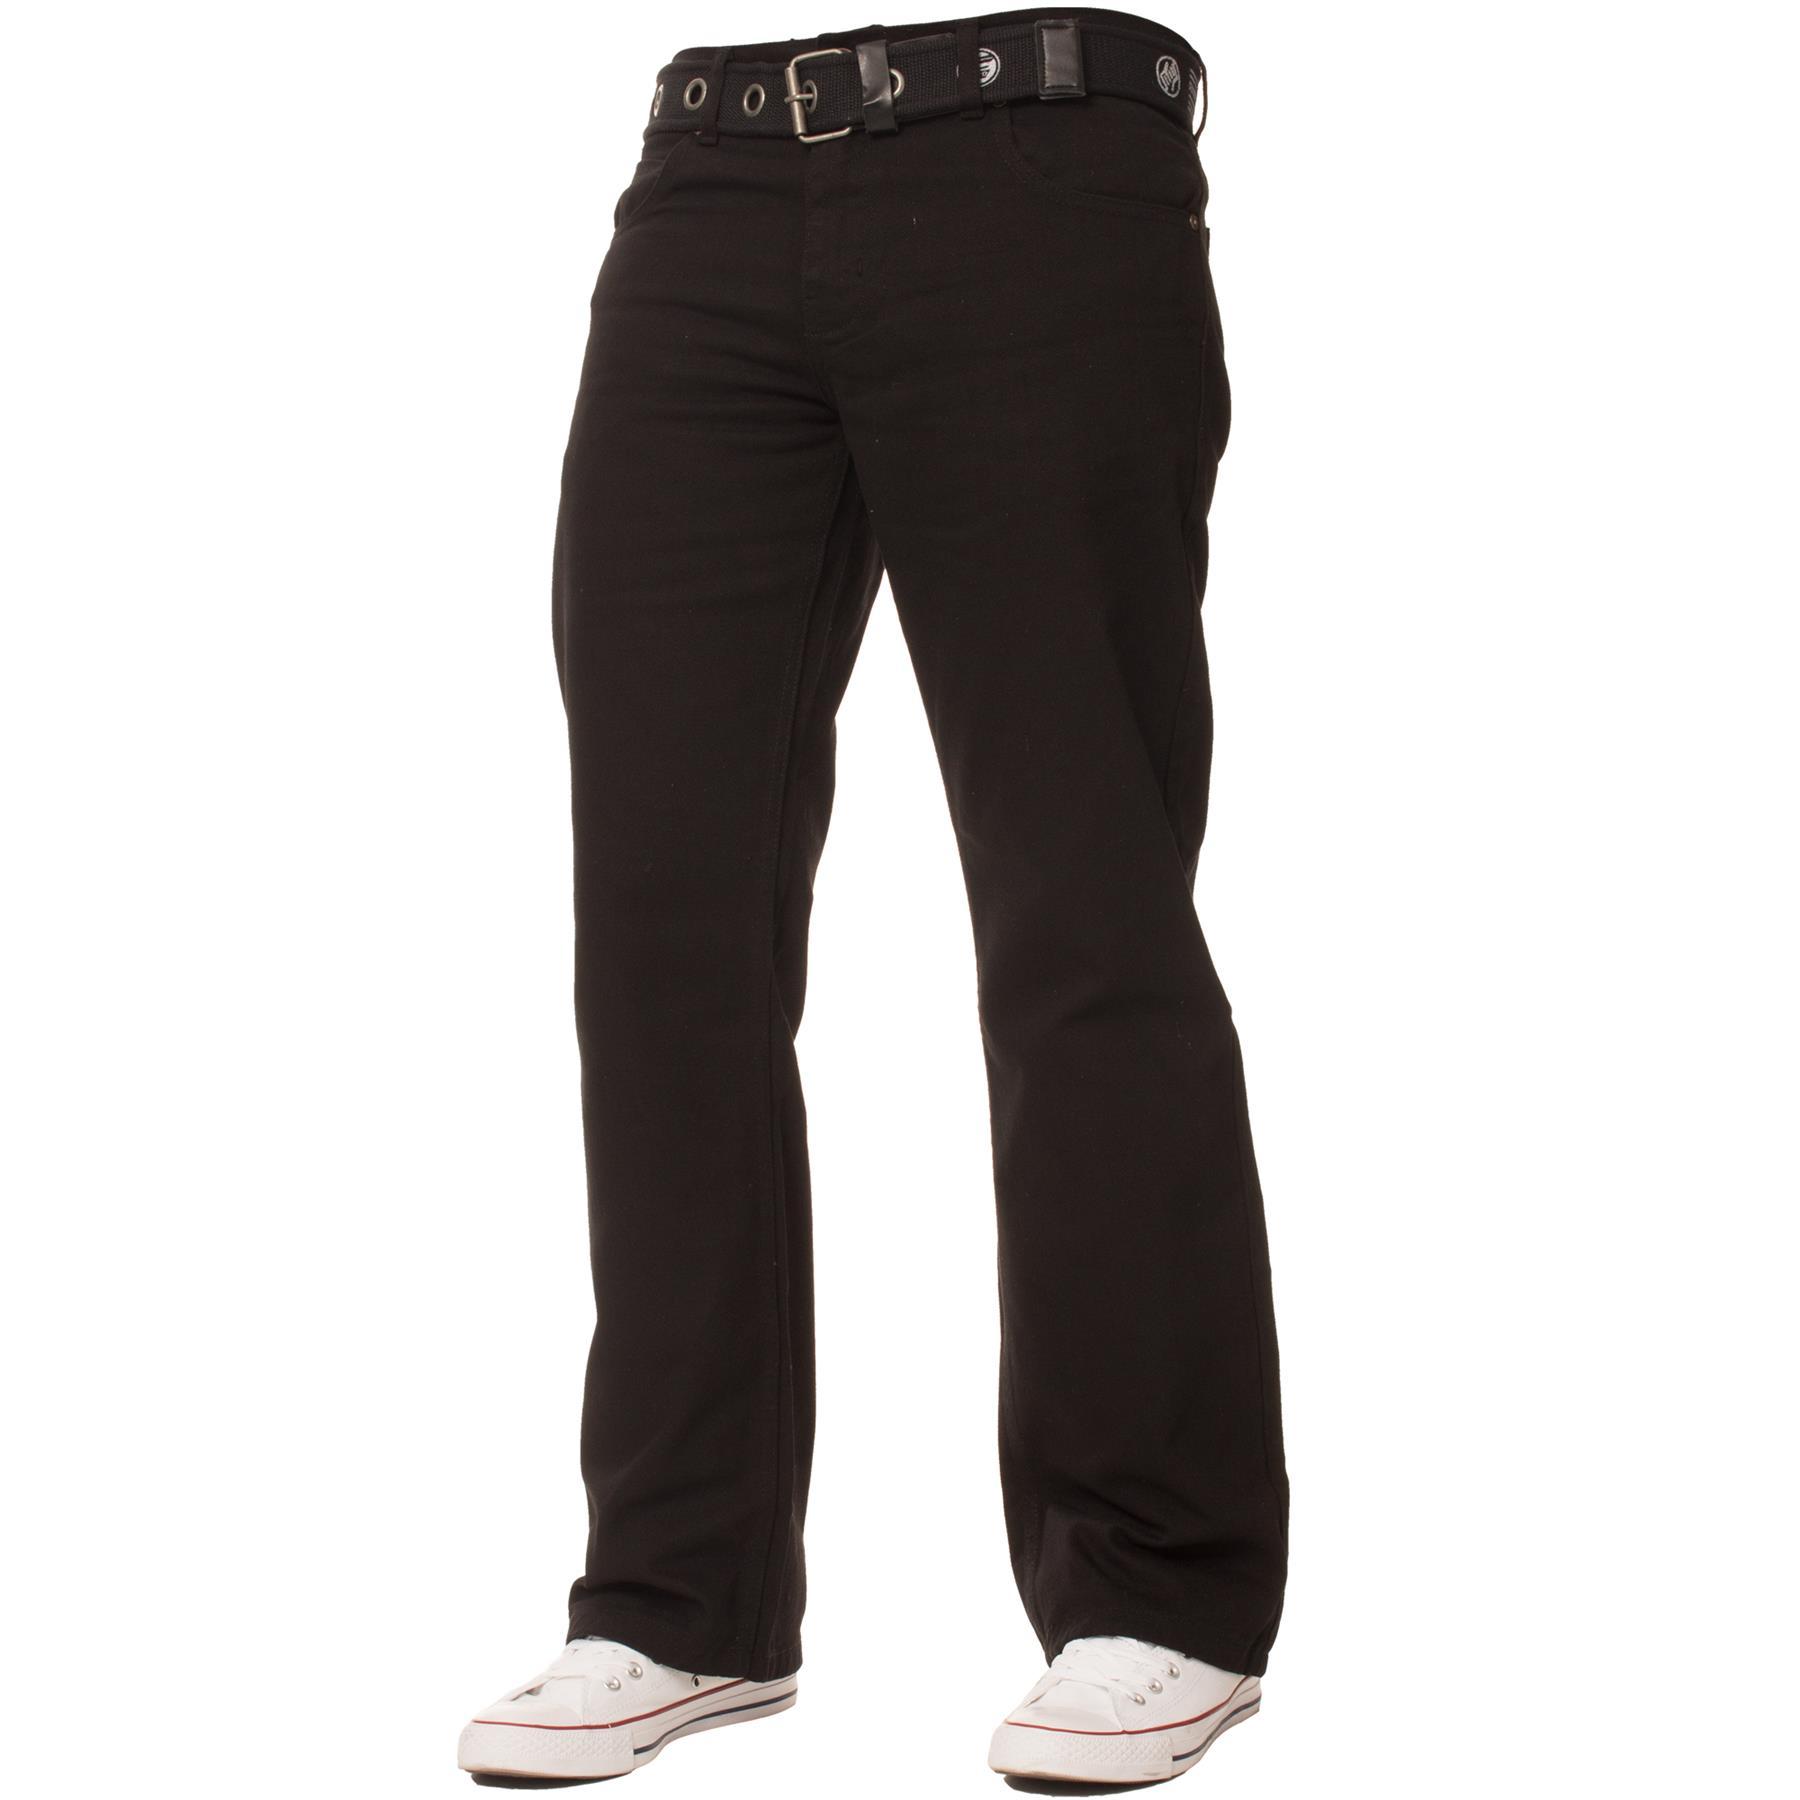 Enzo-Mens-Big-Tall-Jeans-Leg-King-Size-Denim-Pants-Chino-Trousers-Pants-44-034-60-034 thumbnail 42